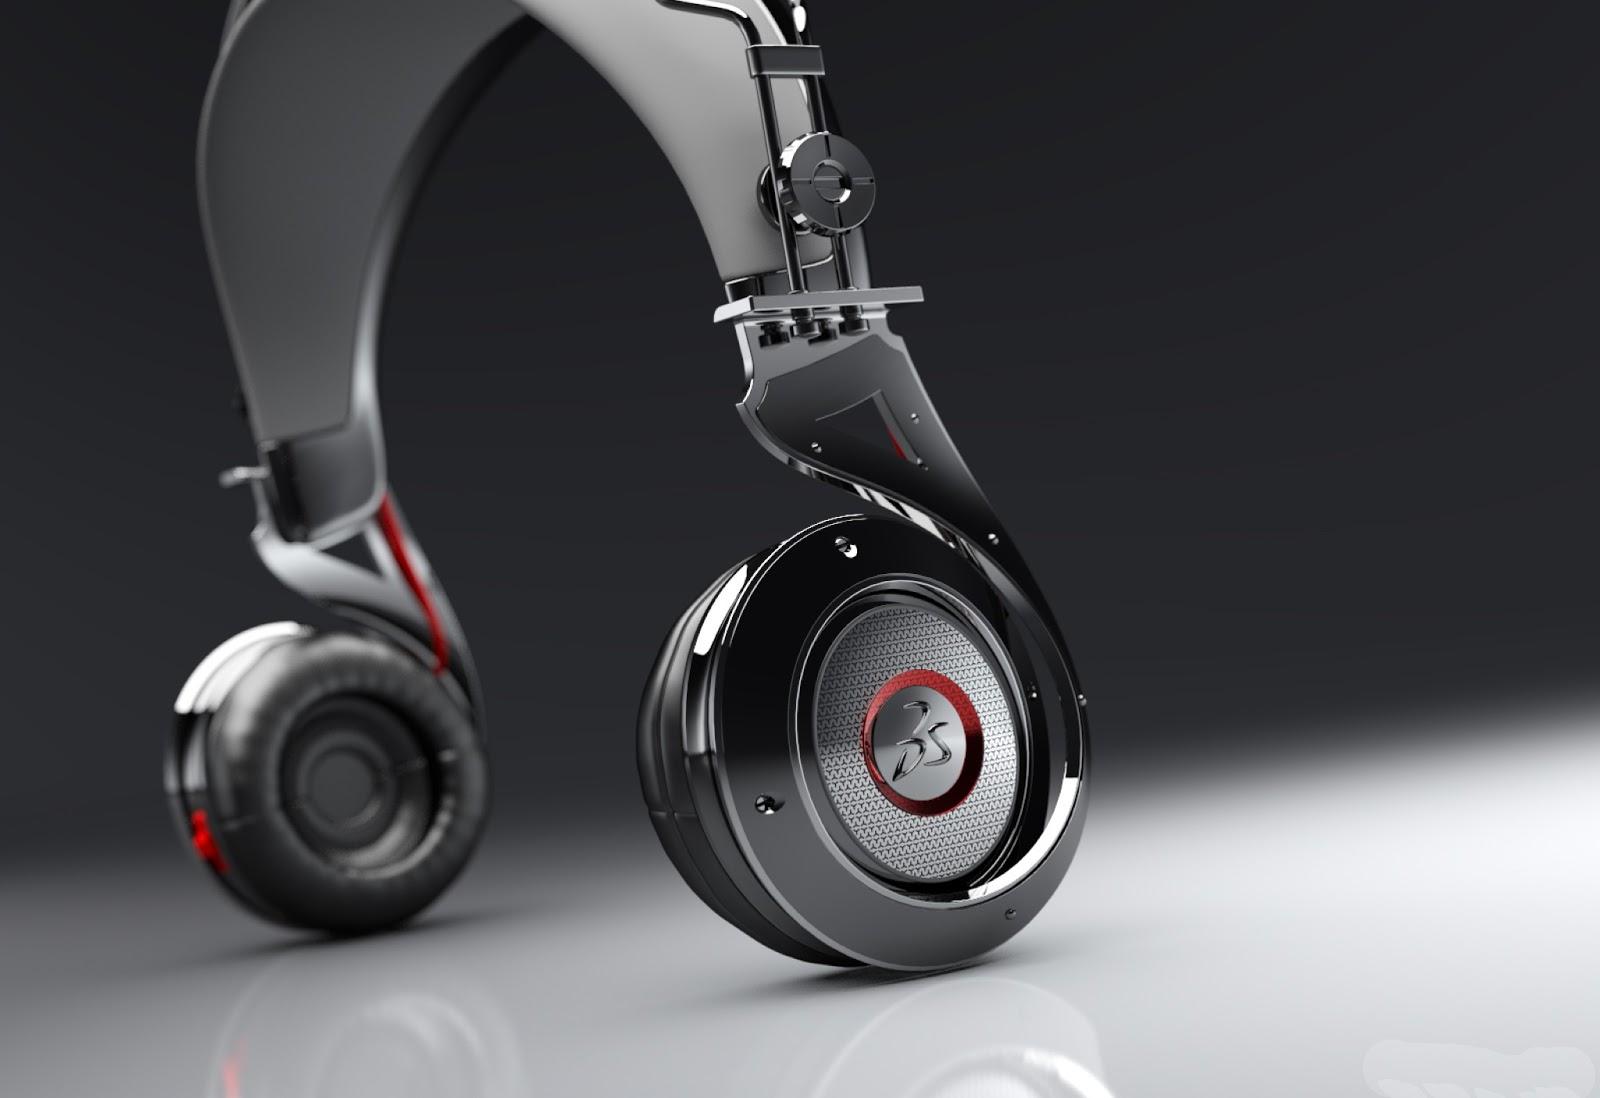 Hd Wallpapers Free Dj Headphonesheadphones Cartoon Hq Hd